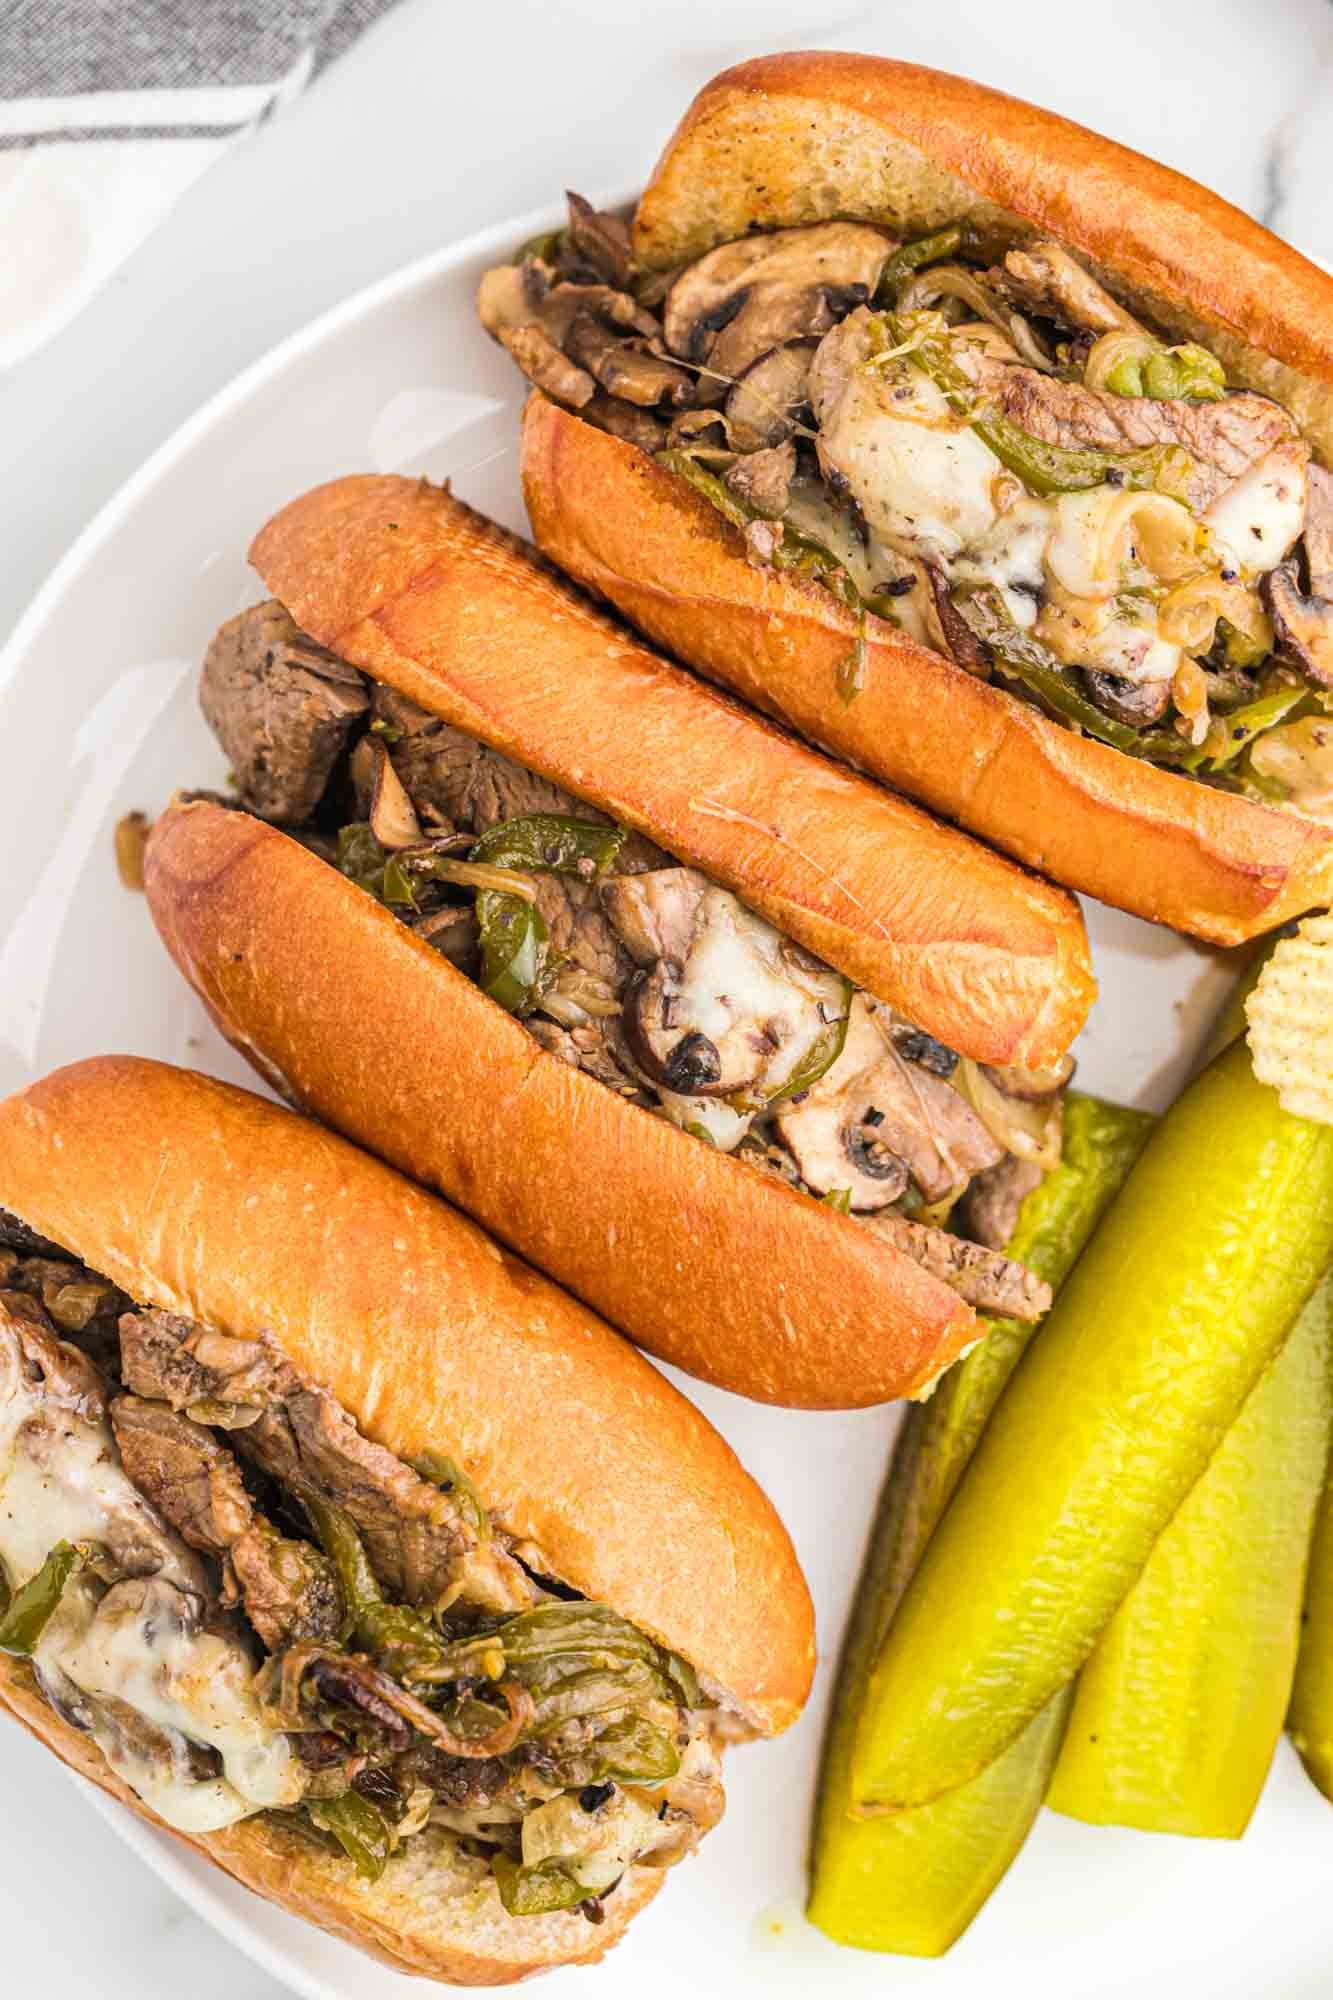 Overhead shot of philly cheesteak sandwiches